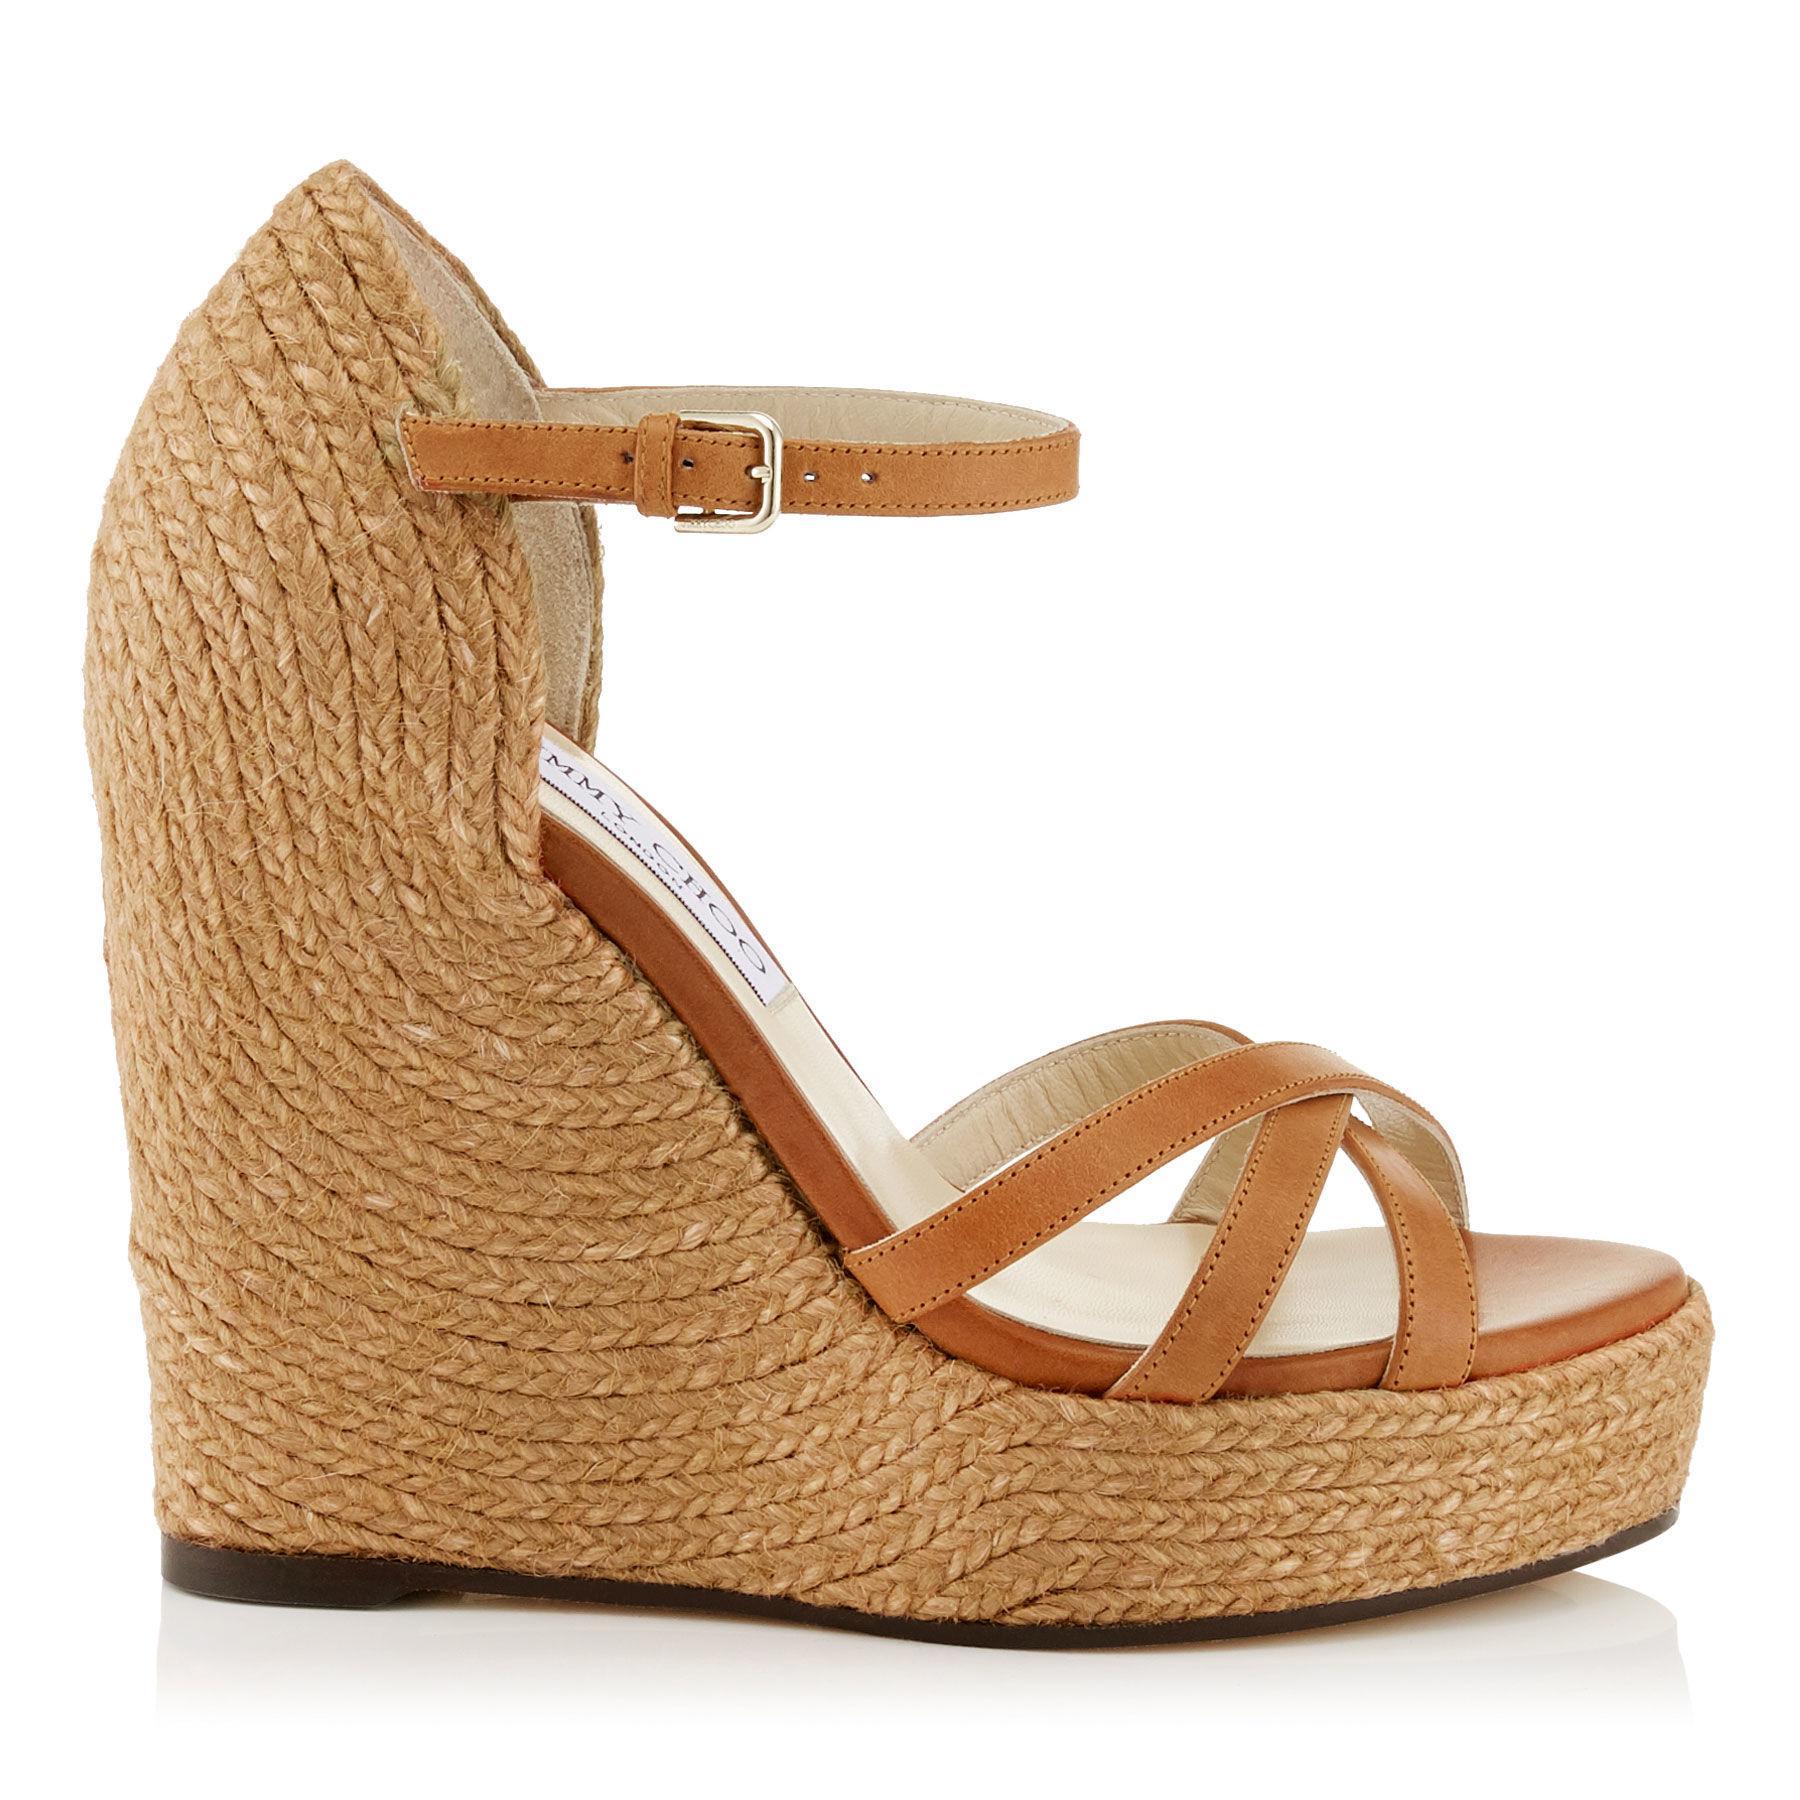 Jimmy choo Delaney high heeled platform wedge sandals Xldz5